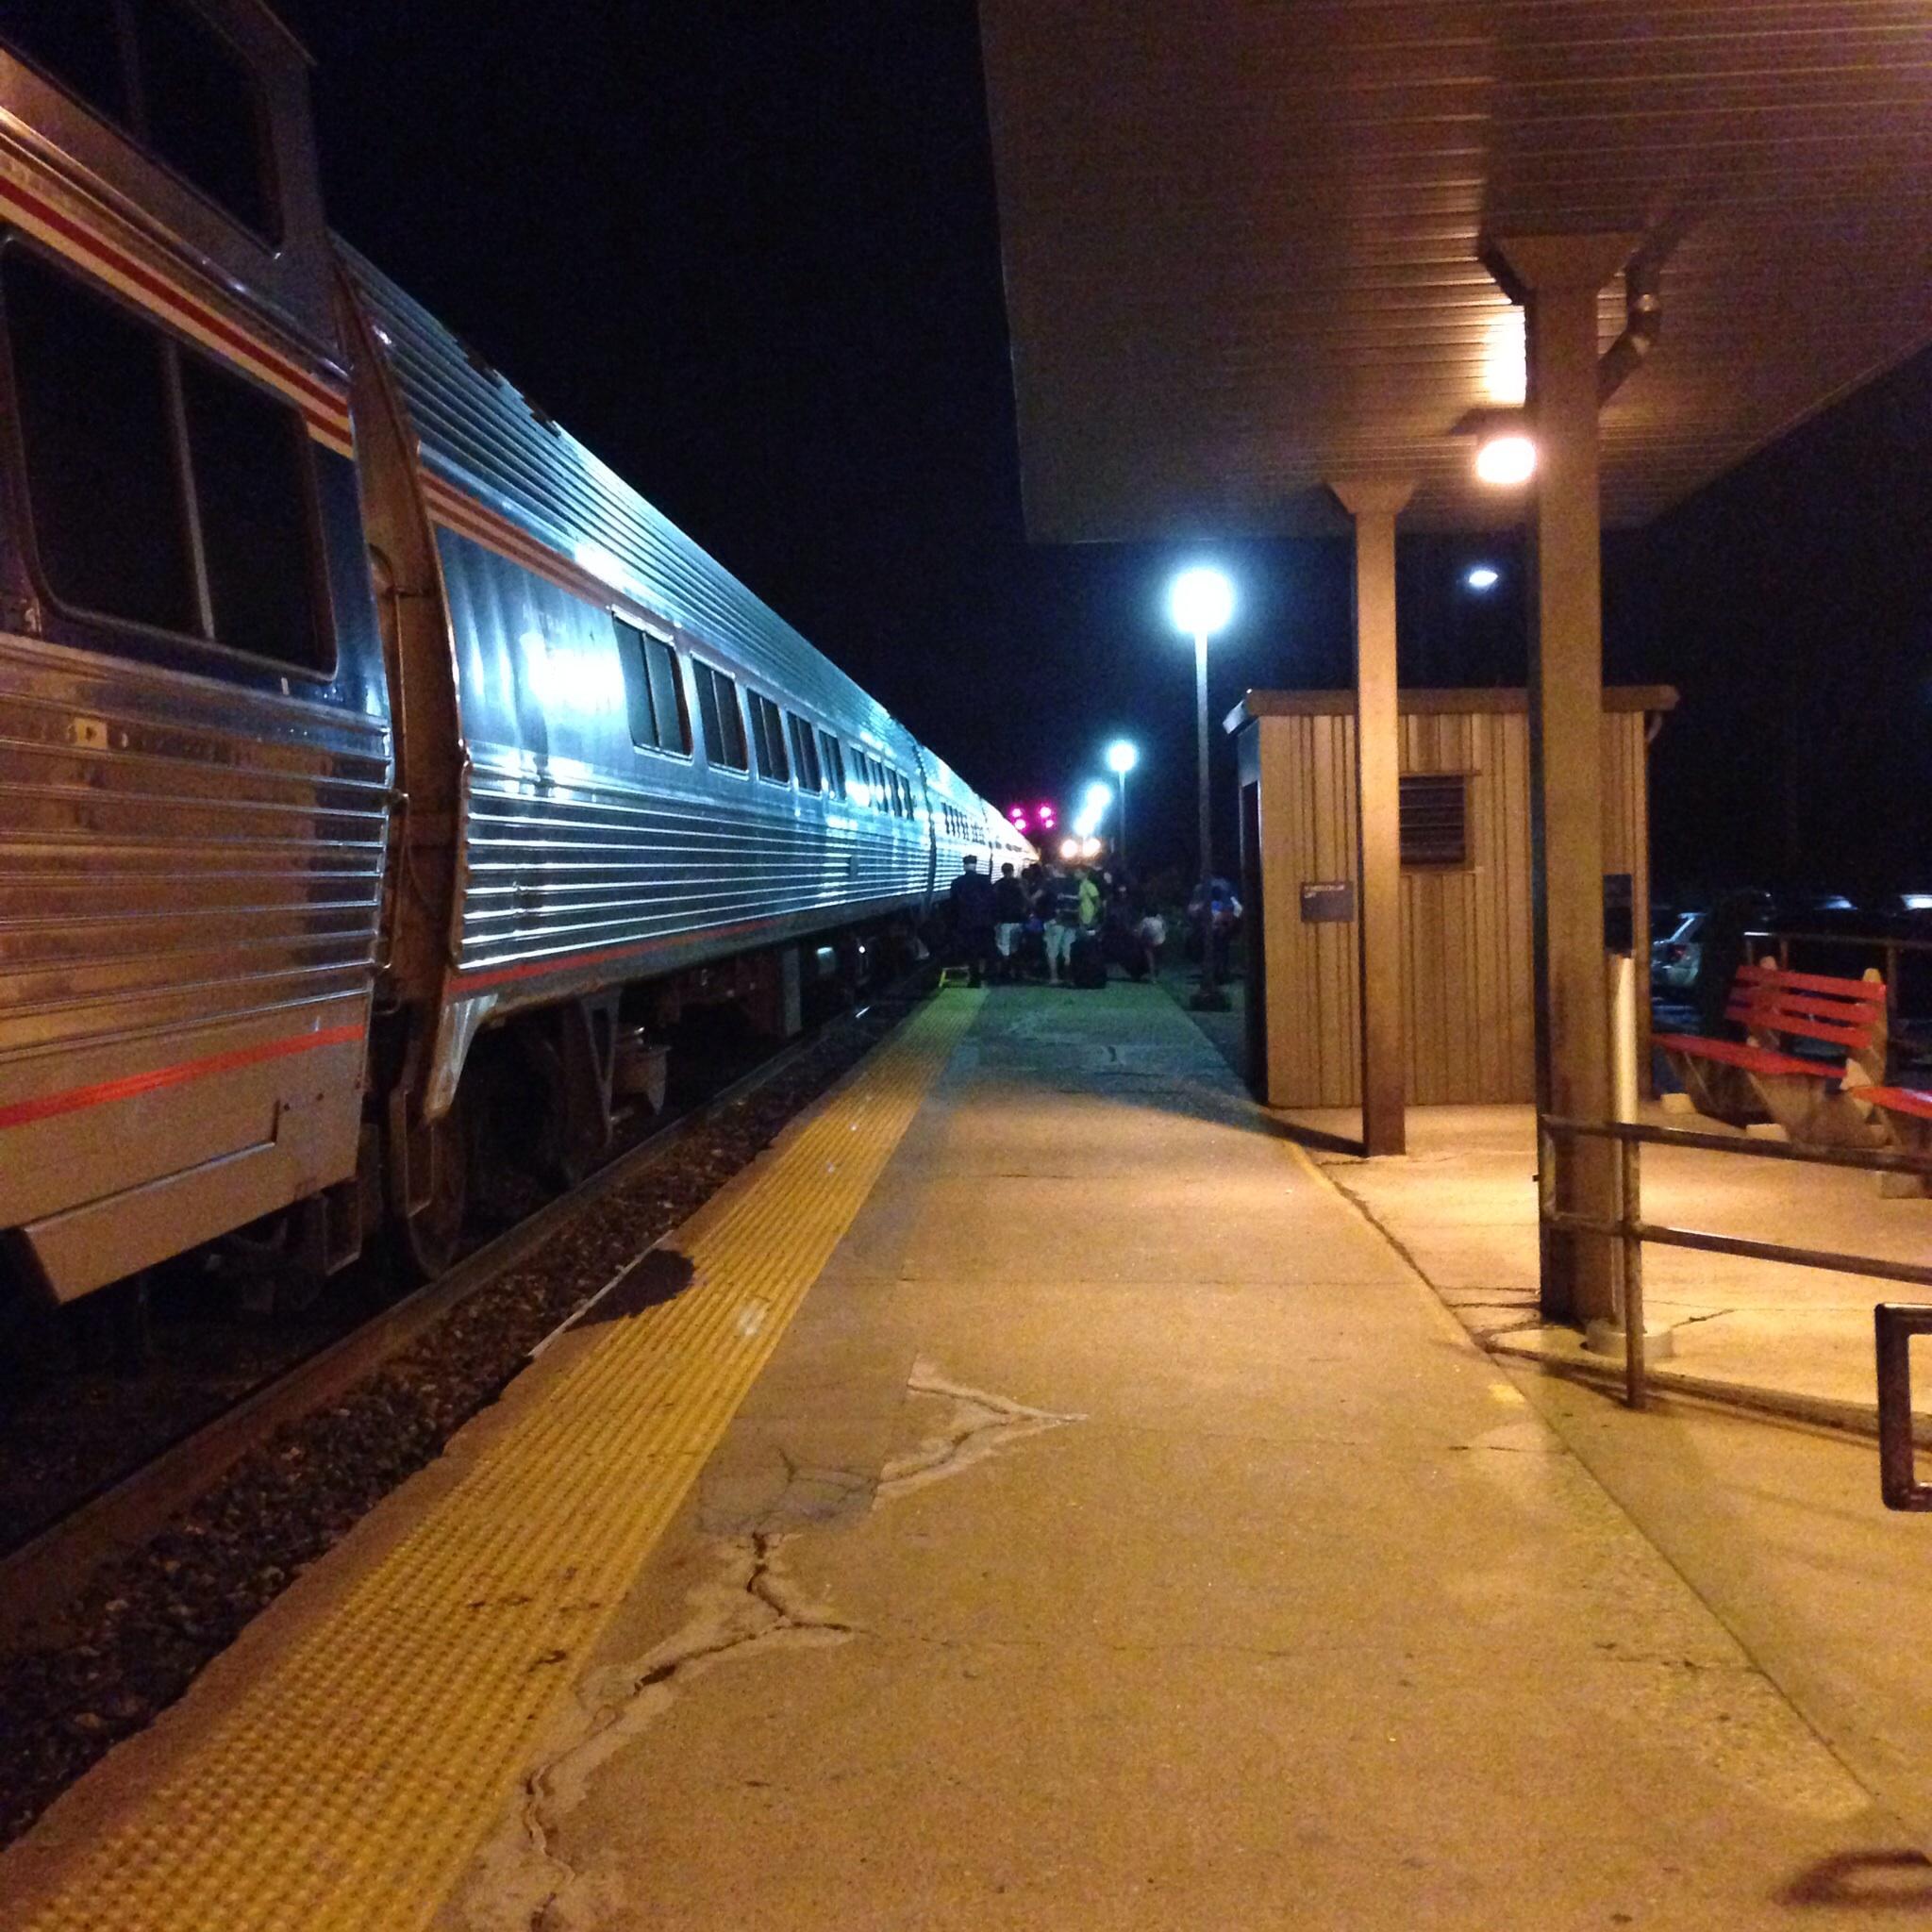 Buffalo Depew Station